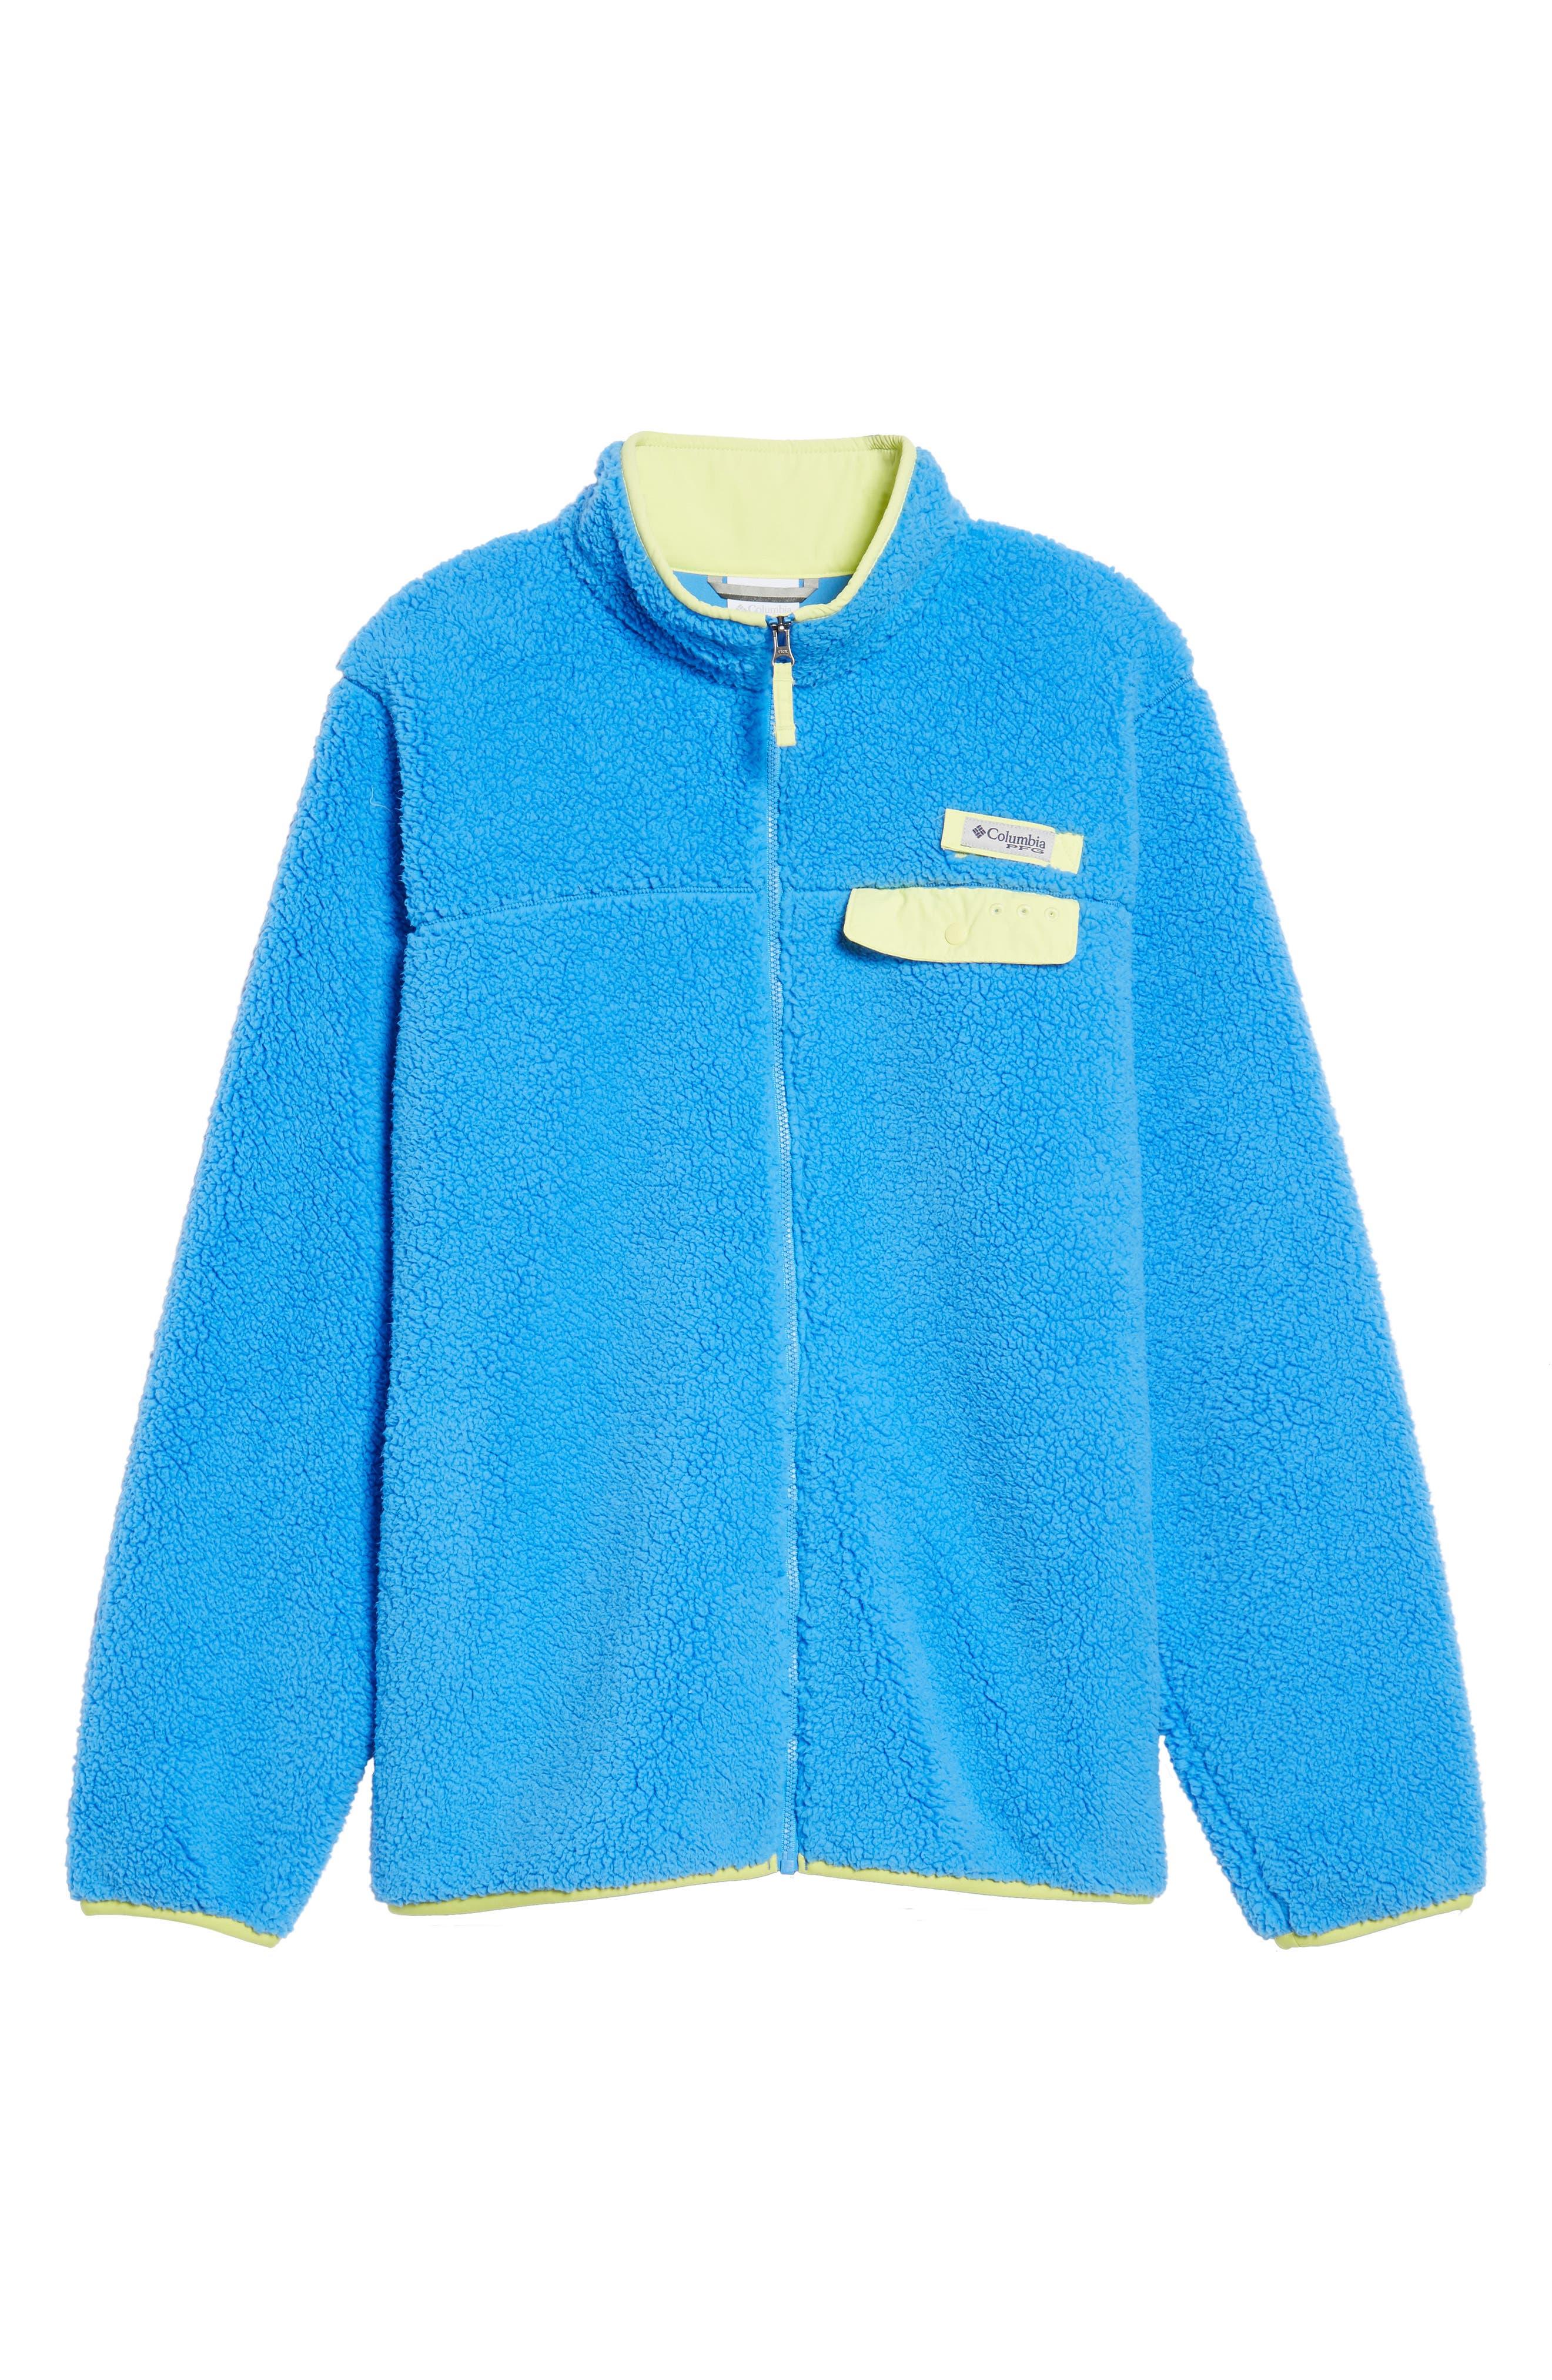 Harborside Fleece Jacket,                             Alternate thumbnail 25, color,